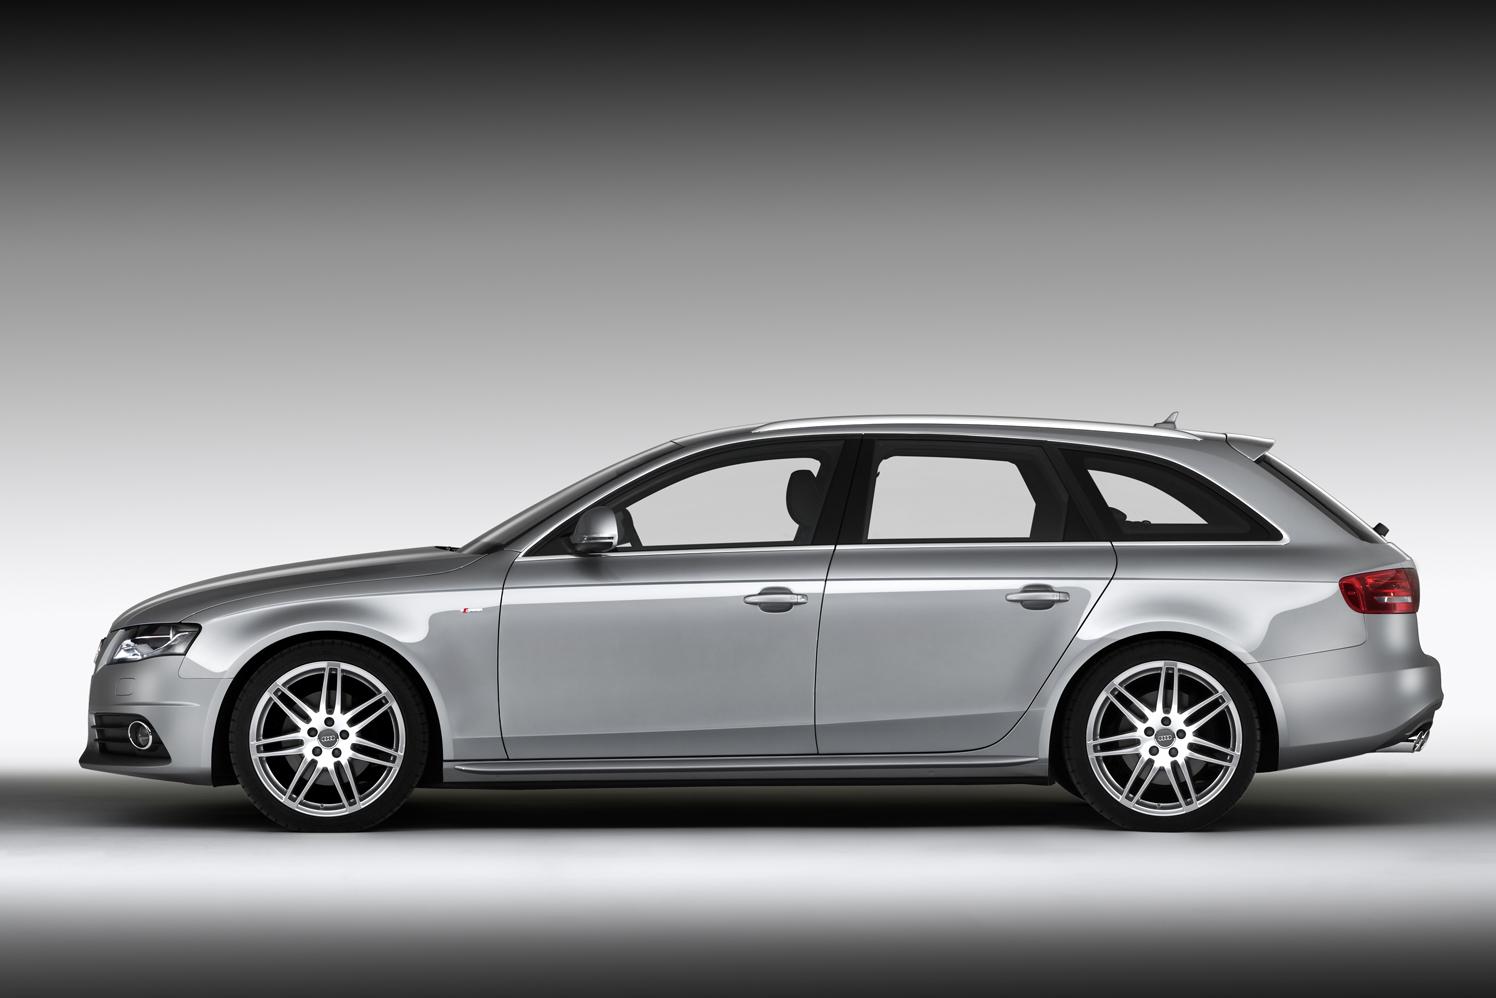 Audi A4 Avant 2.0 T FSi Quattro